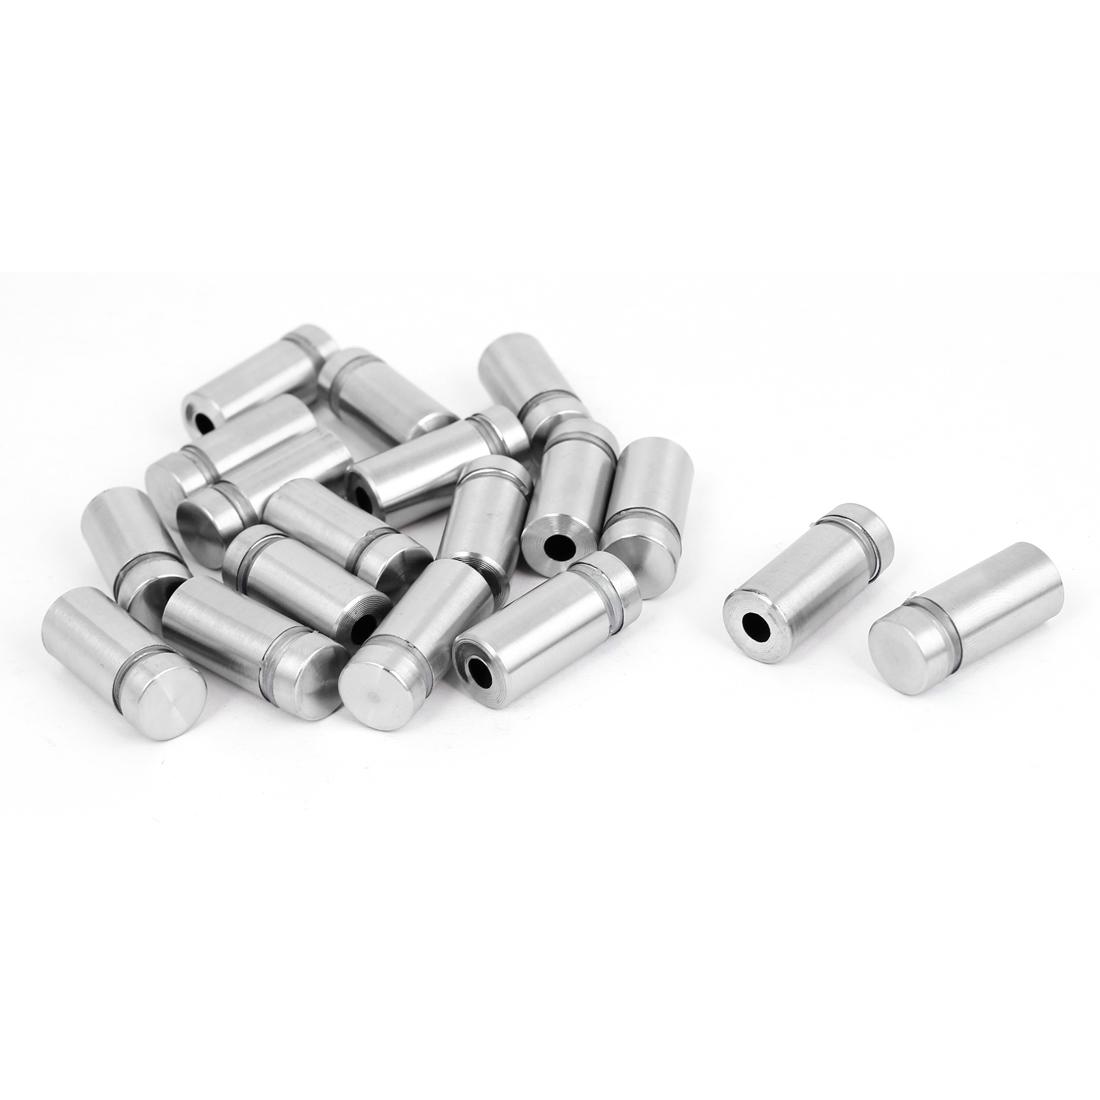 12mm x 25mm Stainless Steel Advertising Frameless Glass Standoff Pins 18pcs